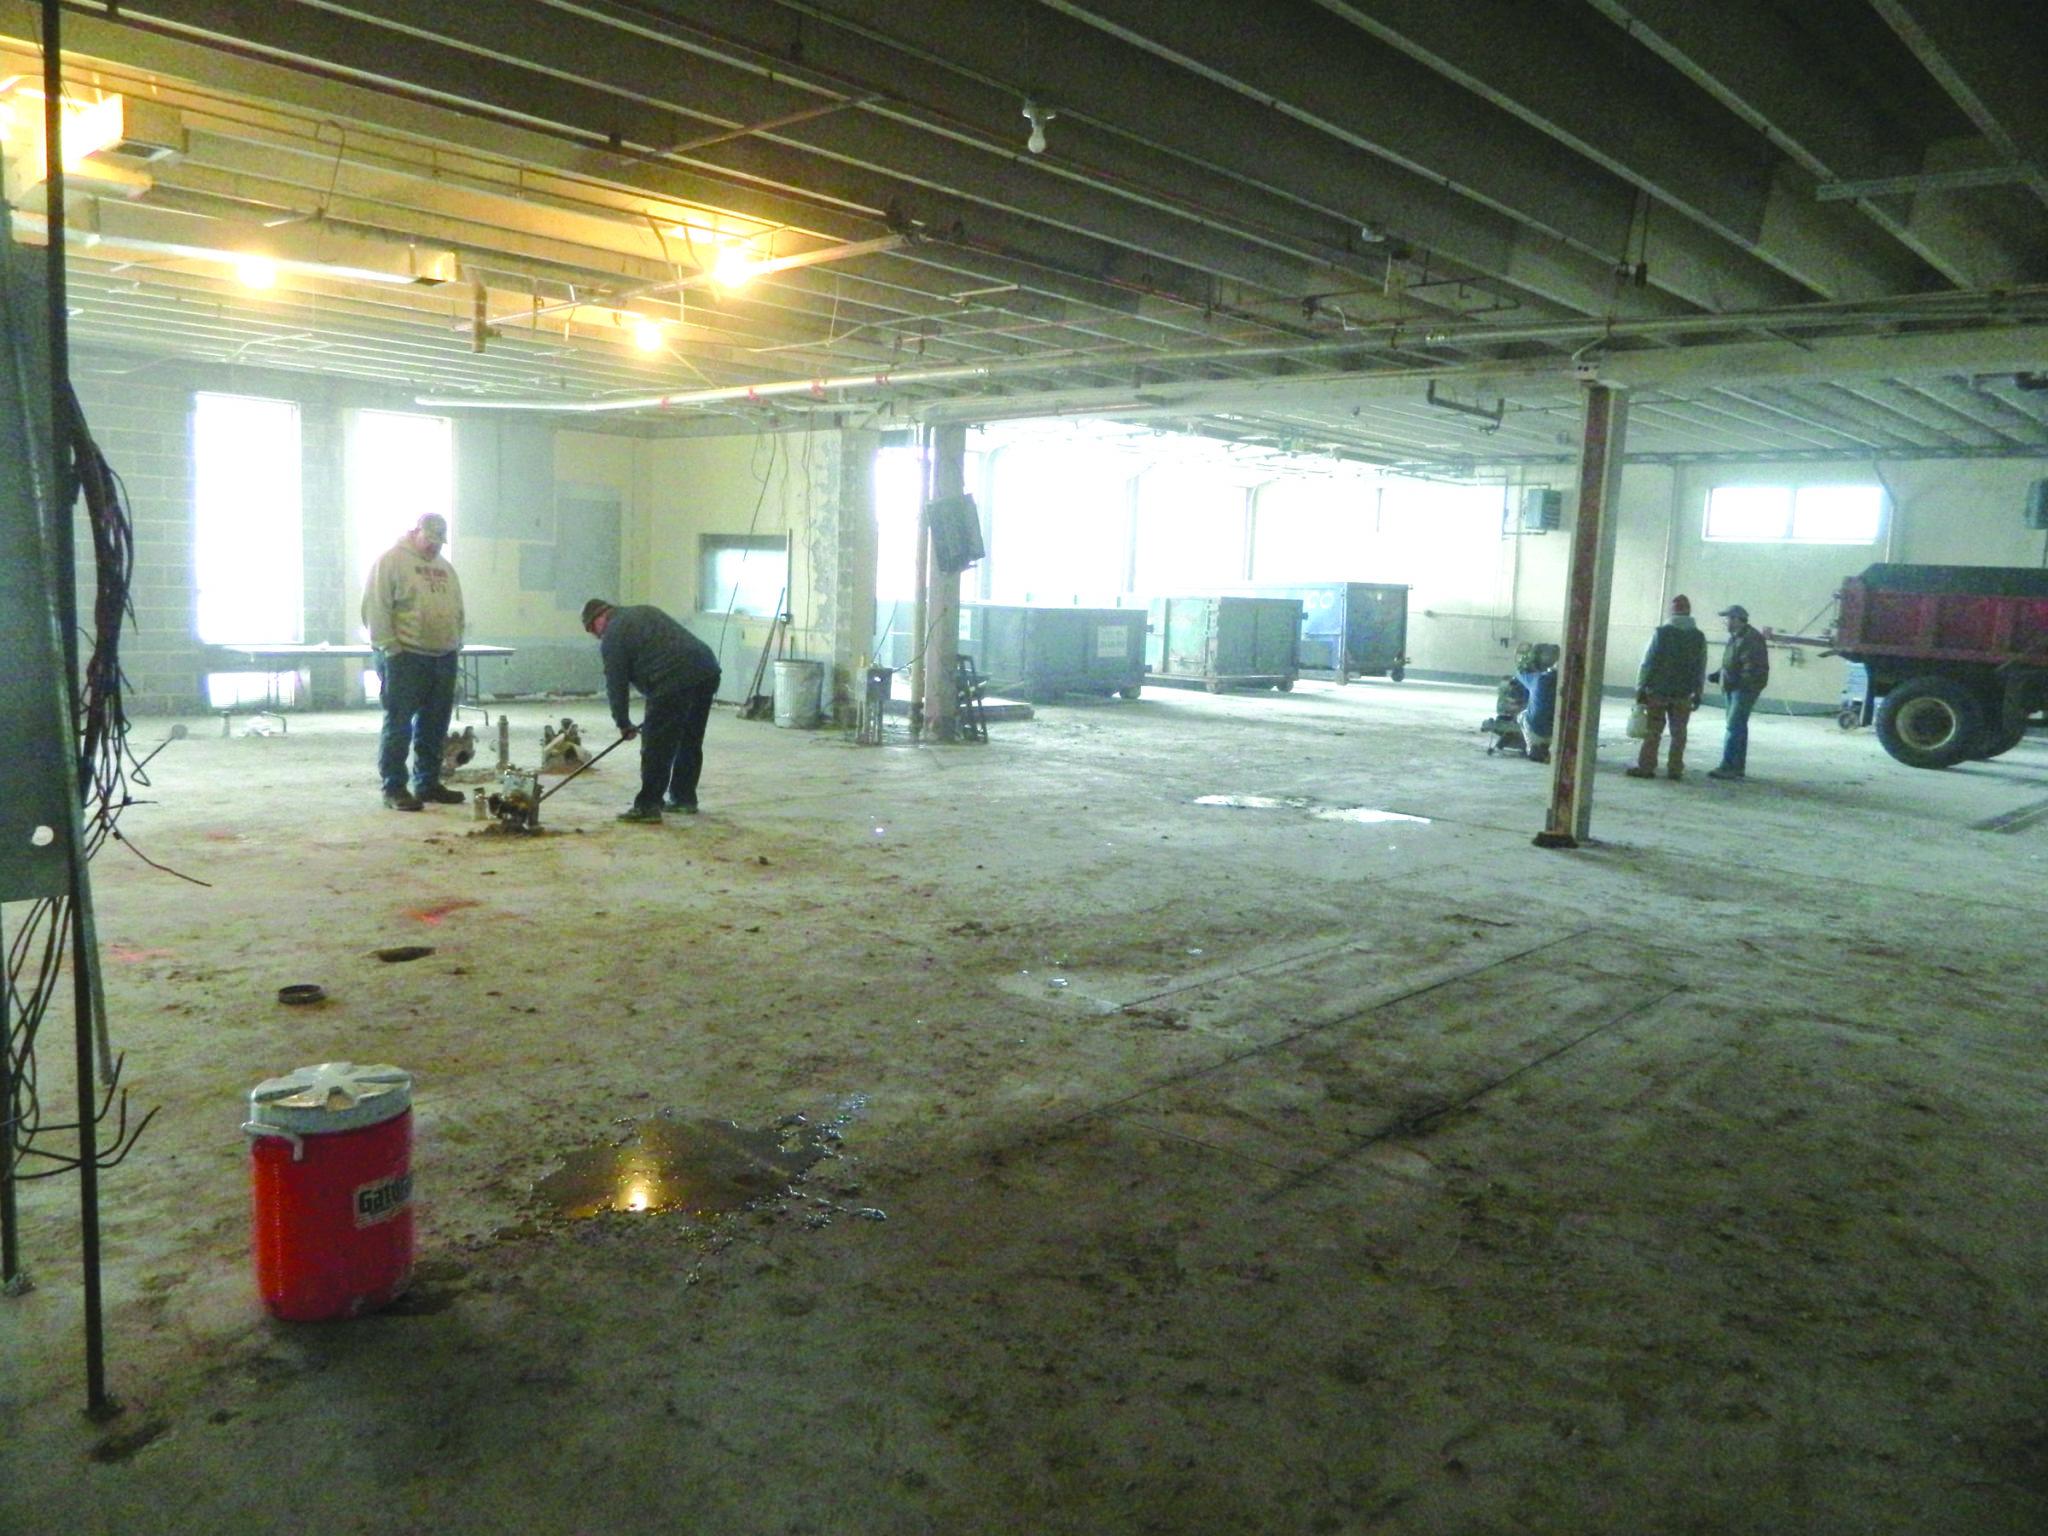 New Skaneateles village hall renovation work begun